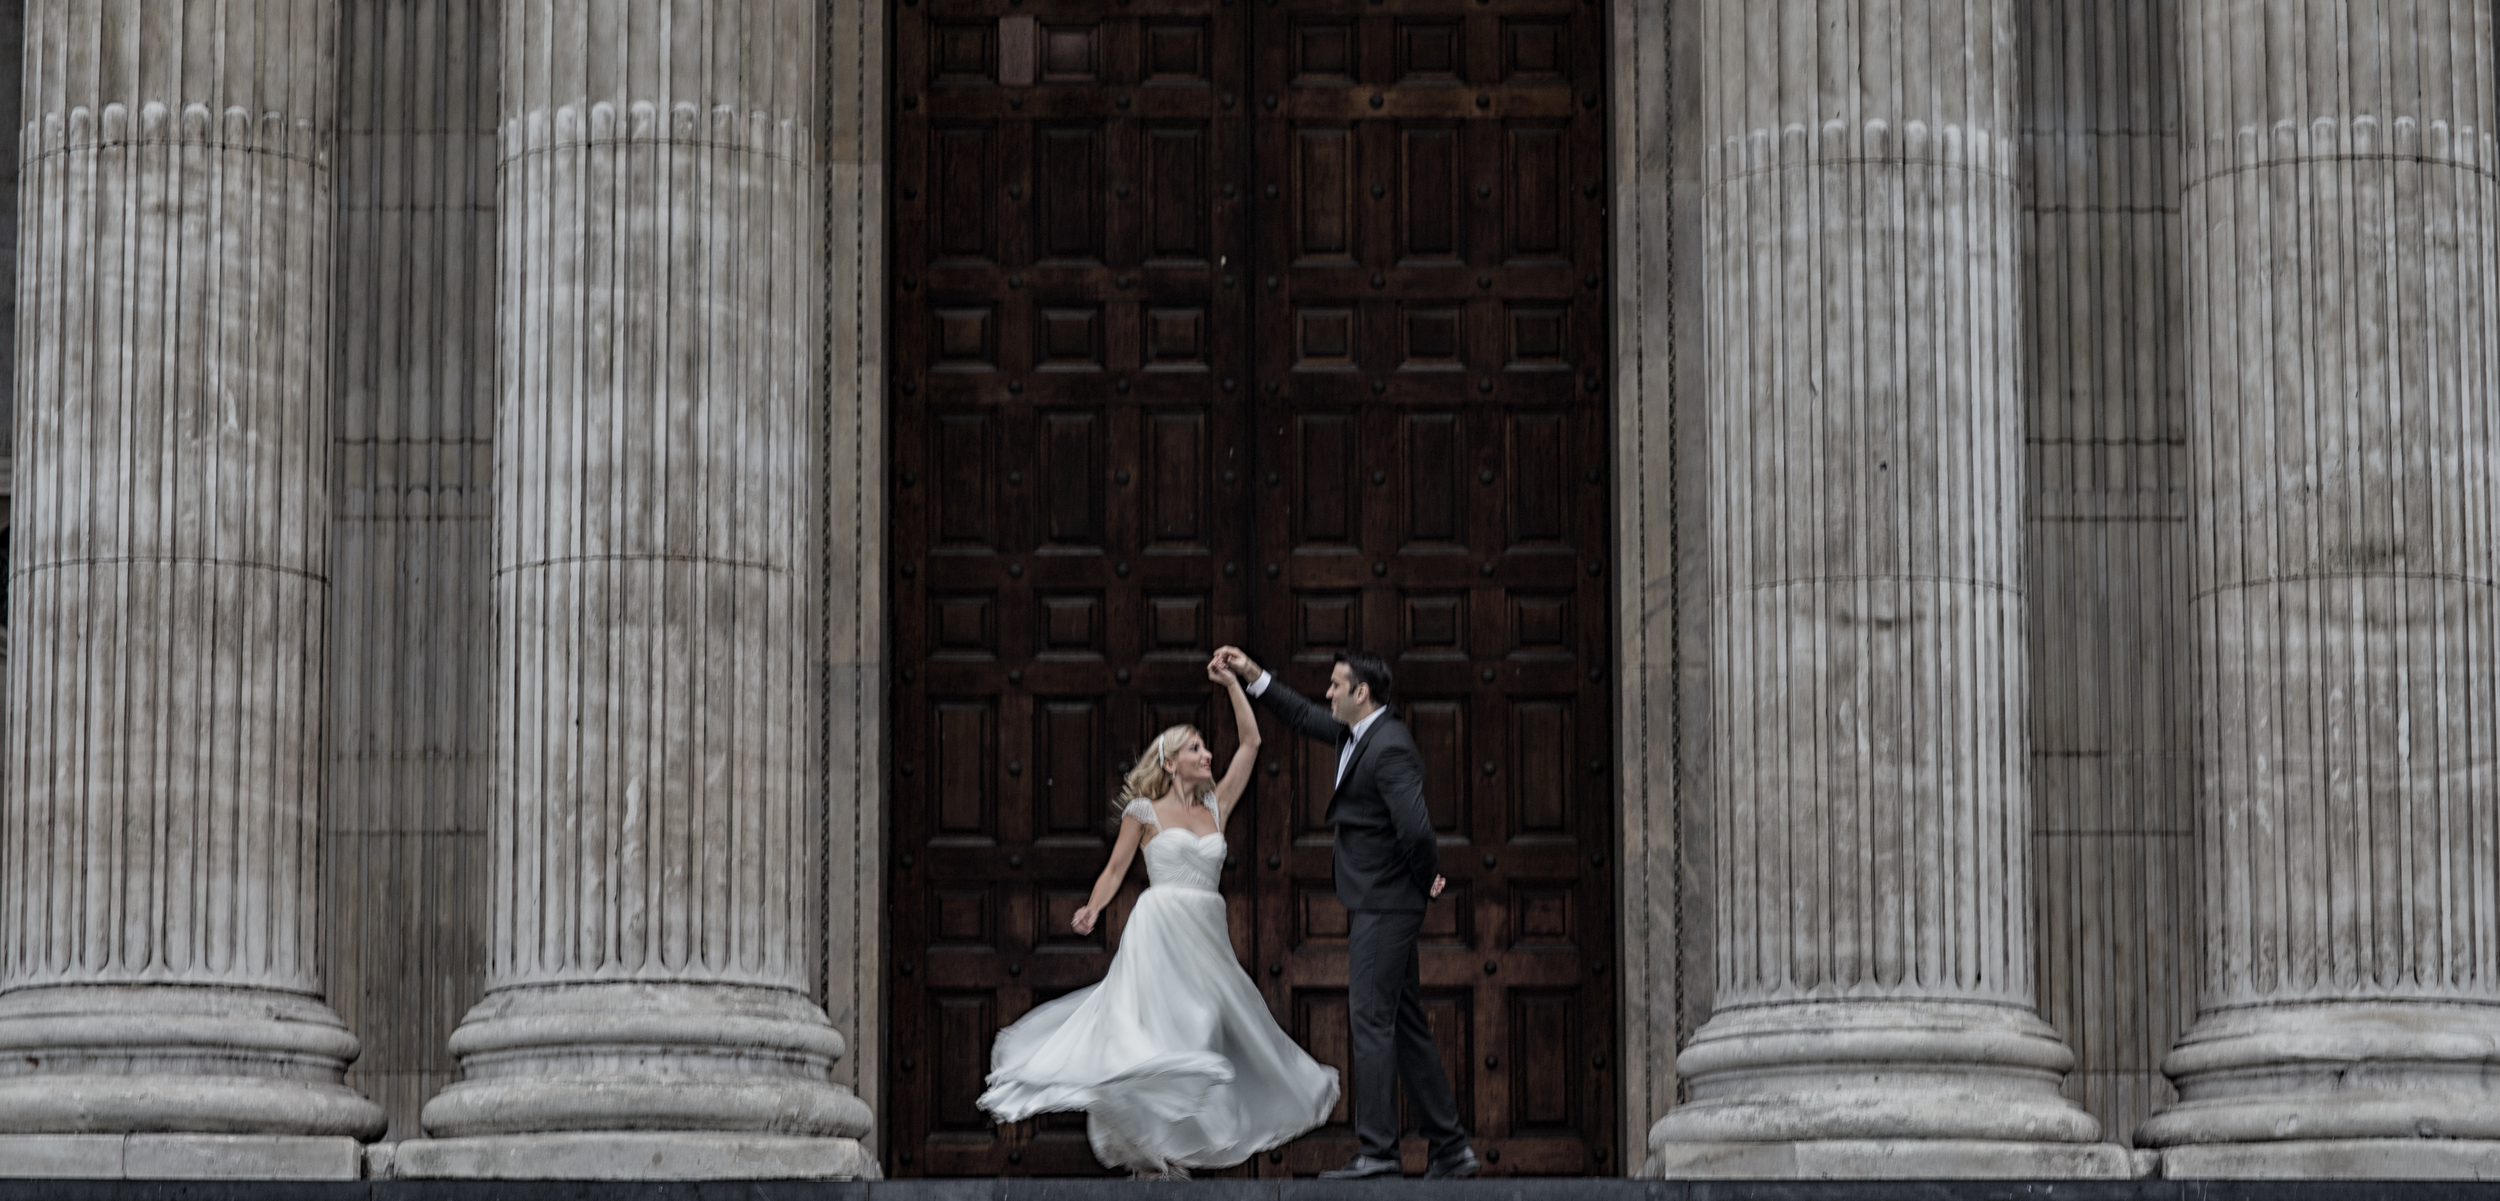 Impavido Studio Engagement Session Tips // The Overwhelmed Bride Wedding Blog + Southern California Wedding Planner